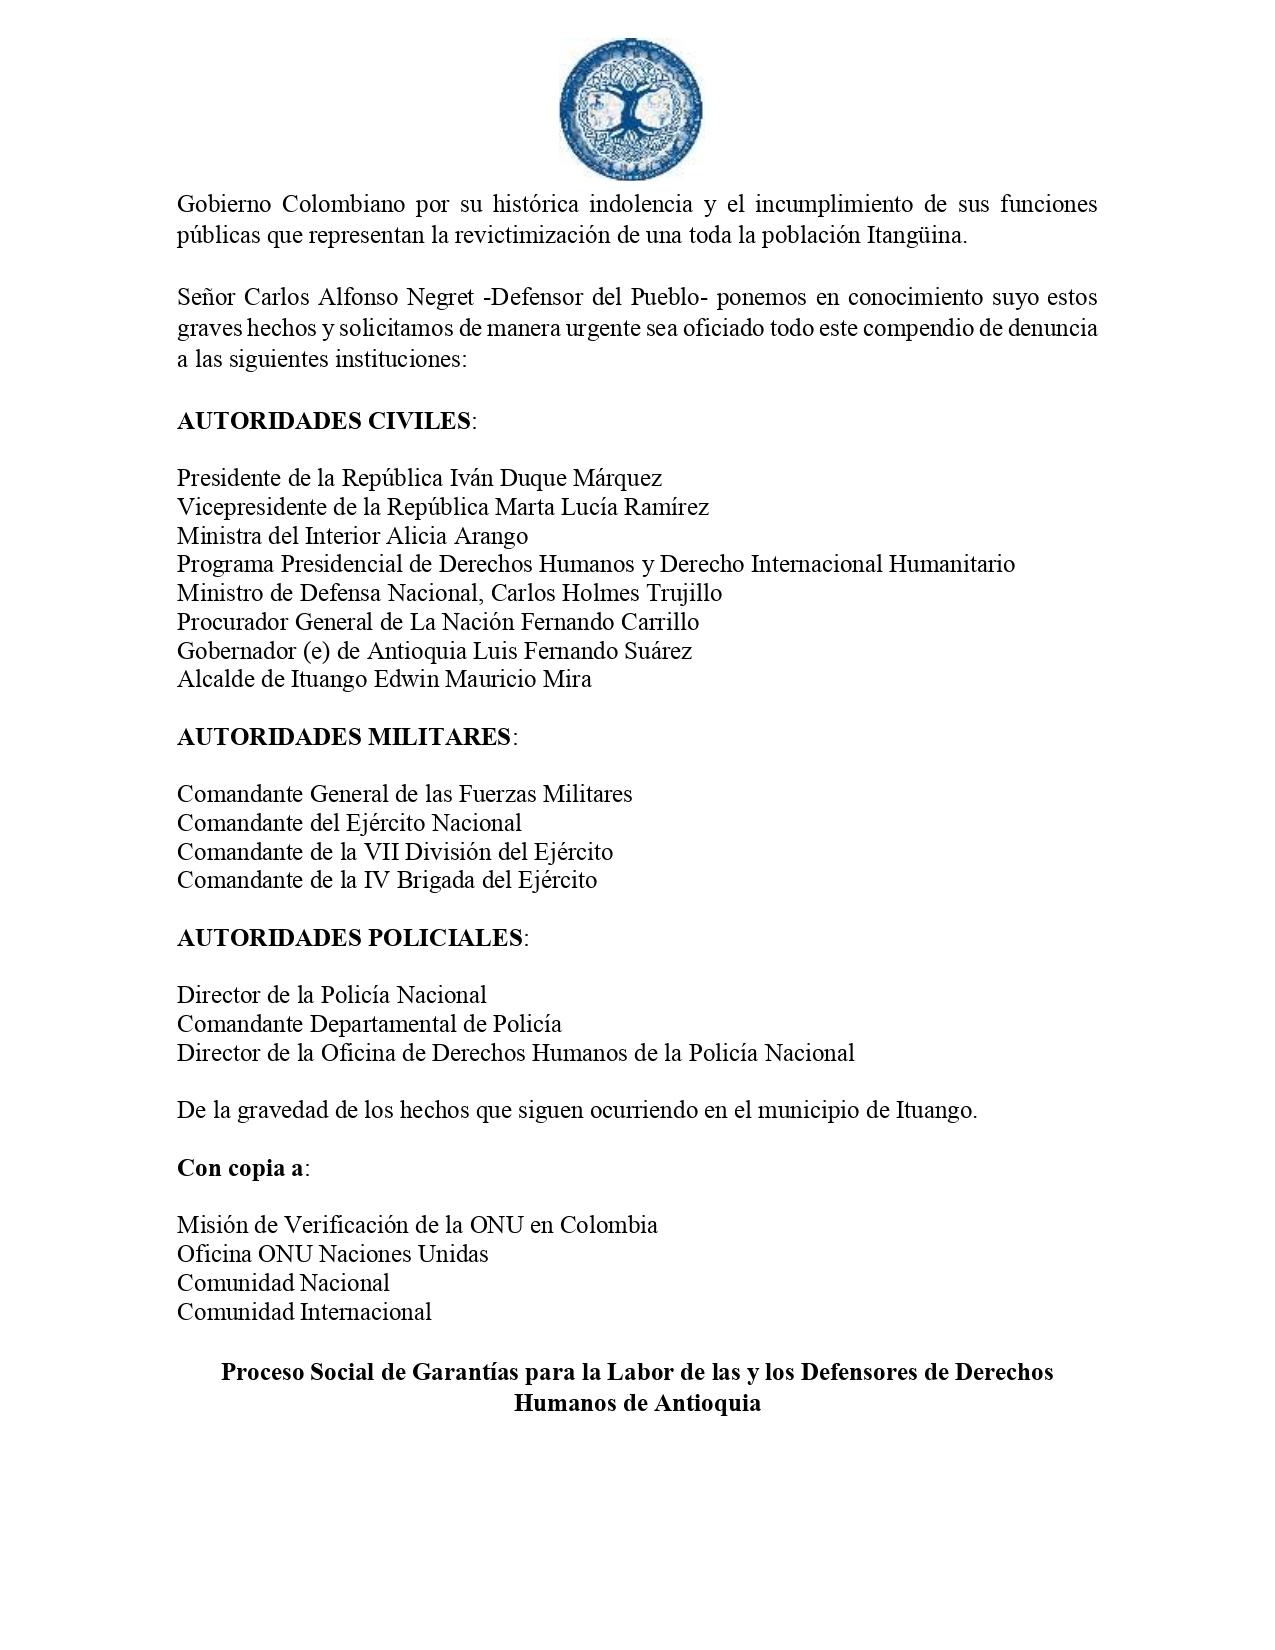 Denuncia de Riesgo Consumado para el municipio de Ituango-Final_page-0003